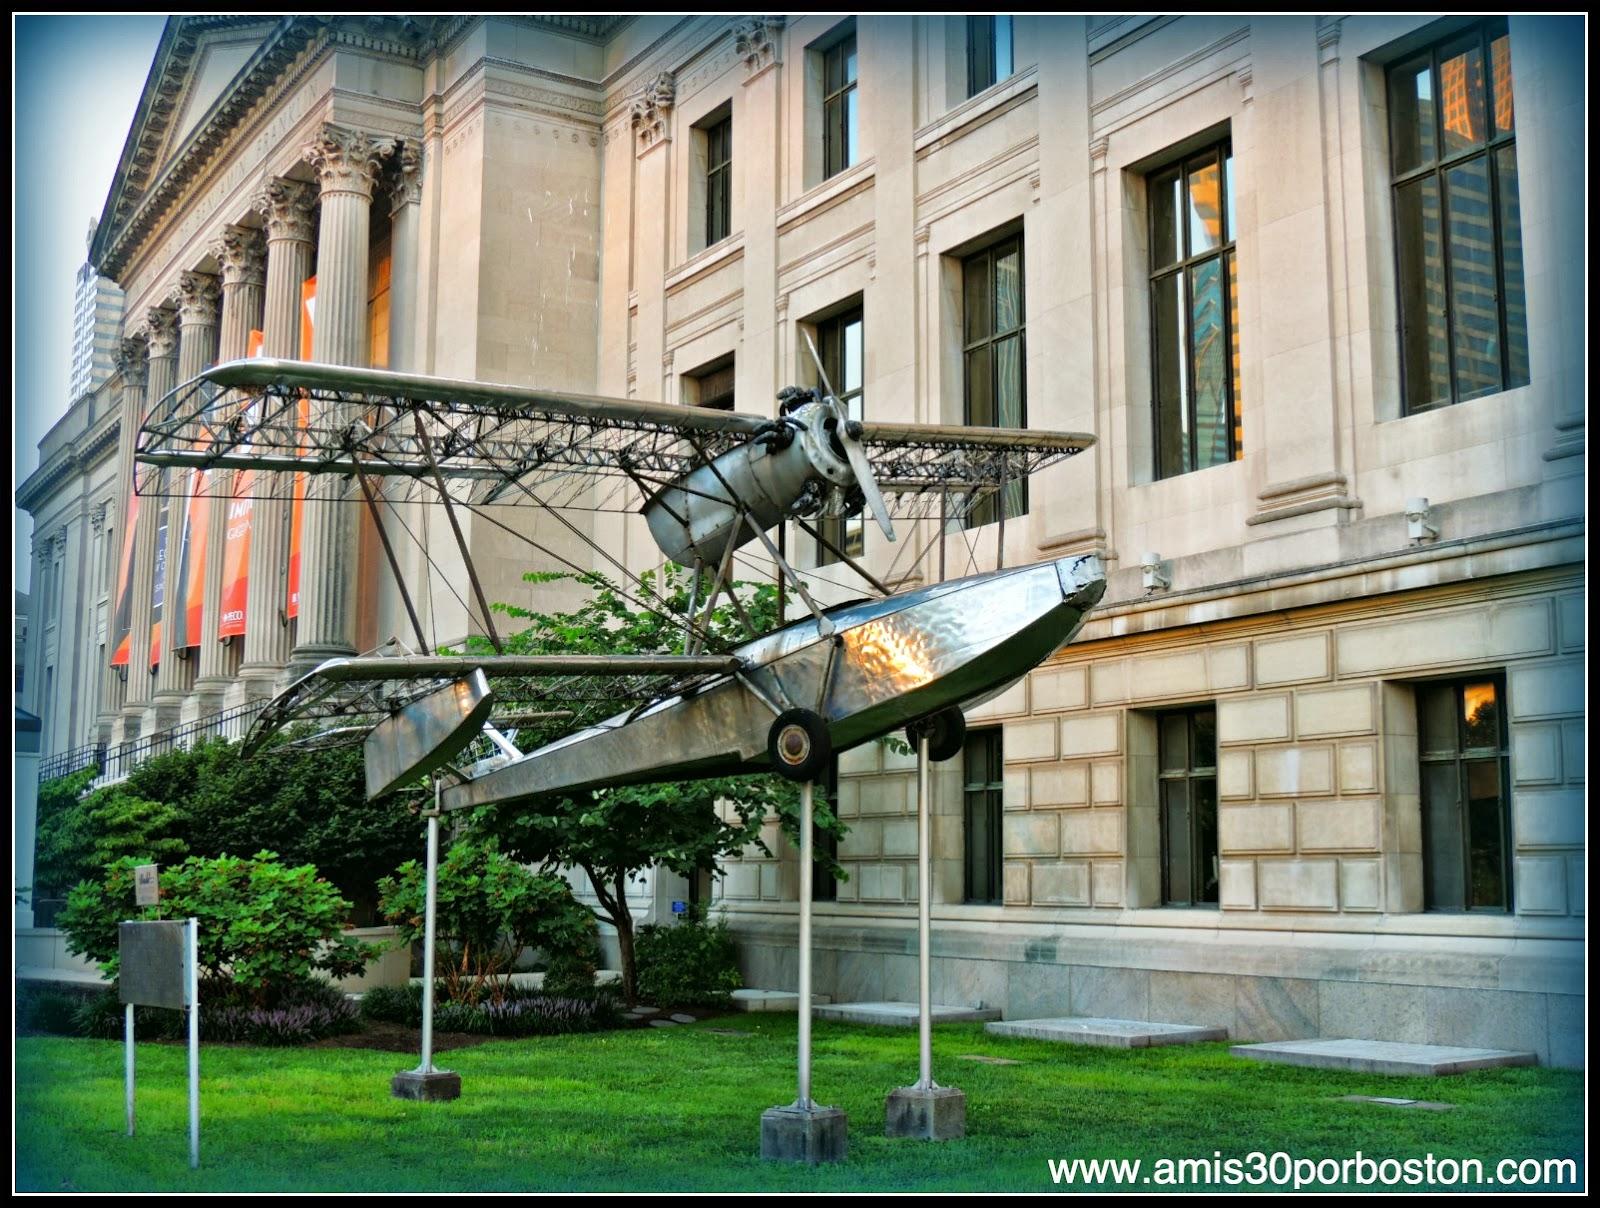 Filadelfia: Franklin Institute